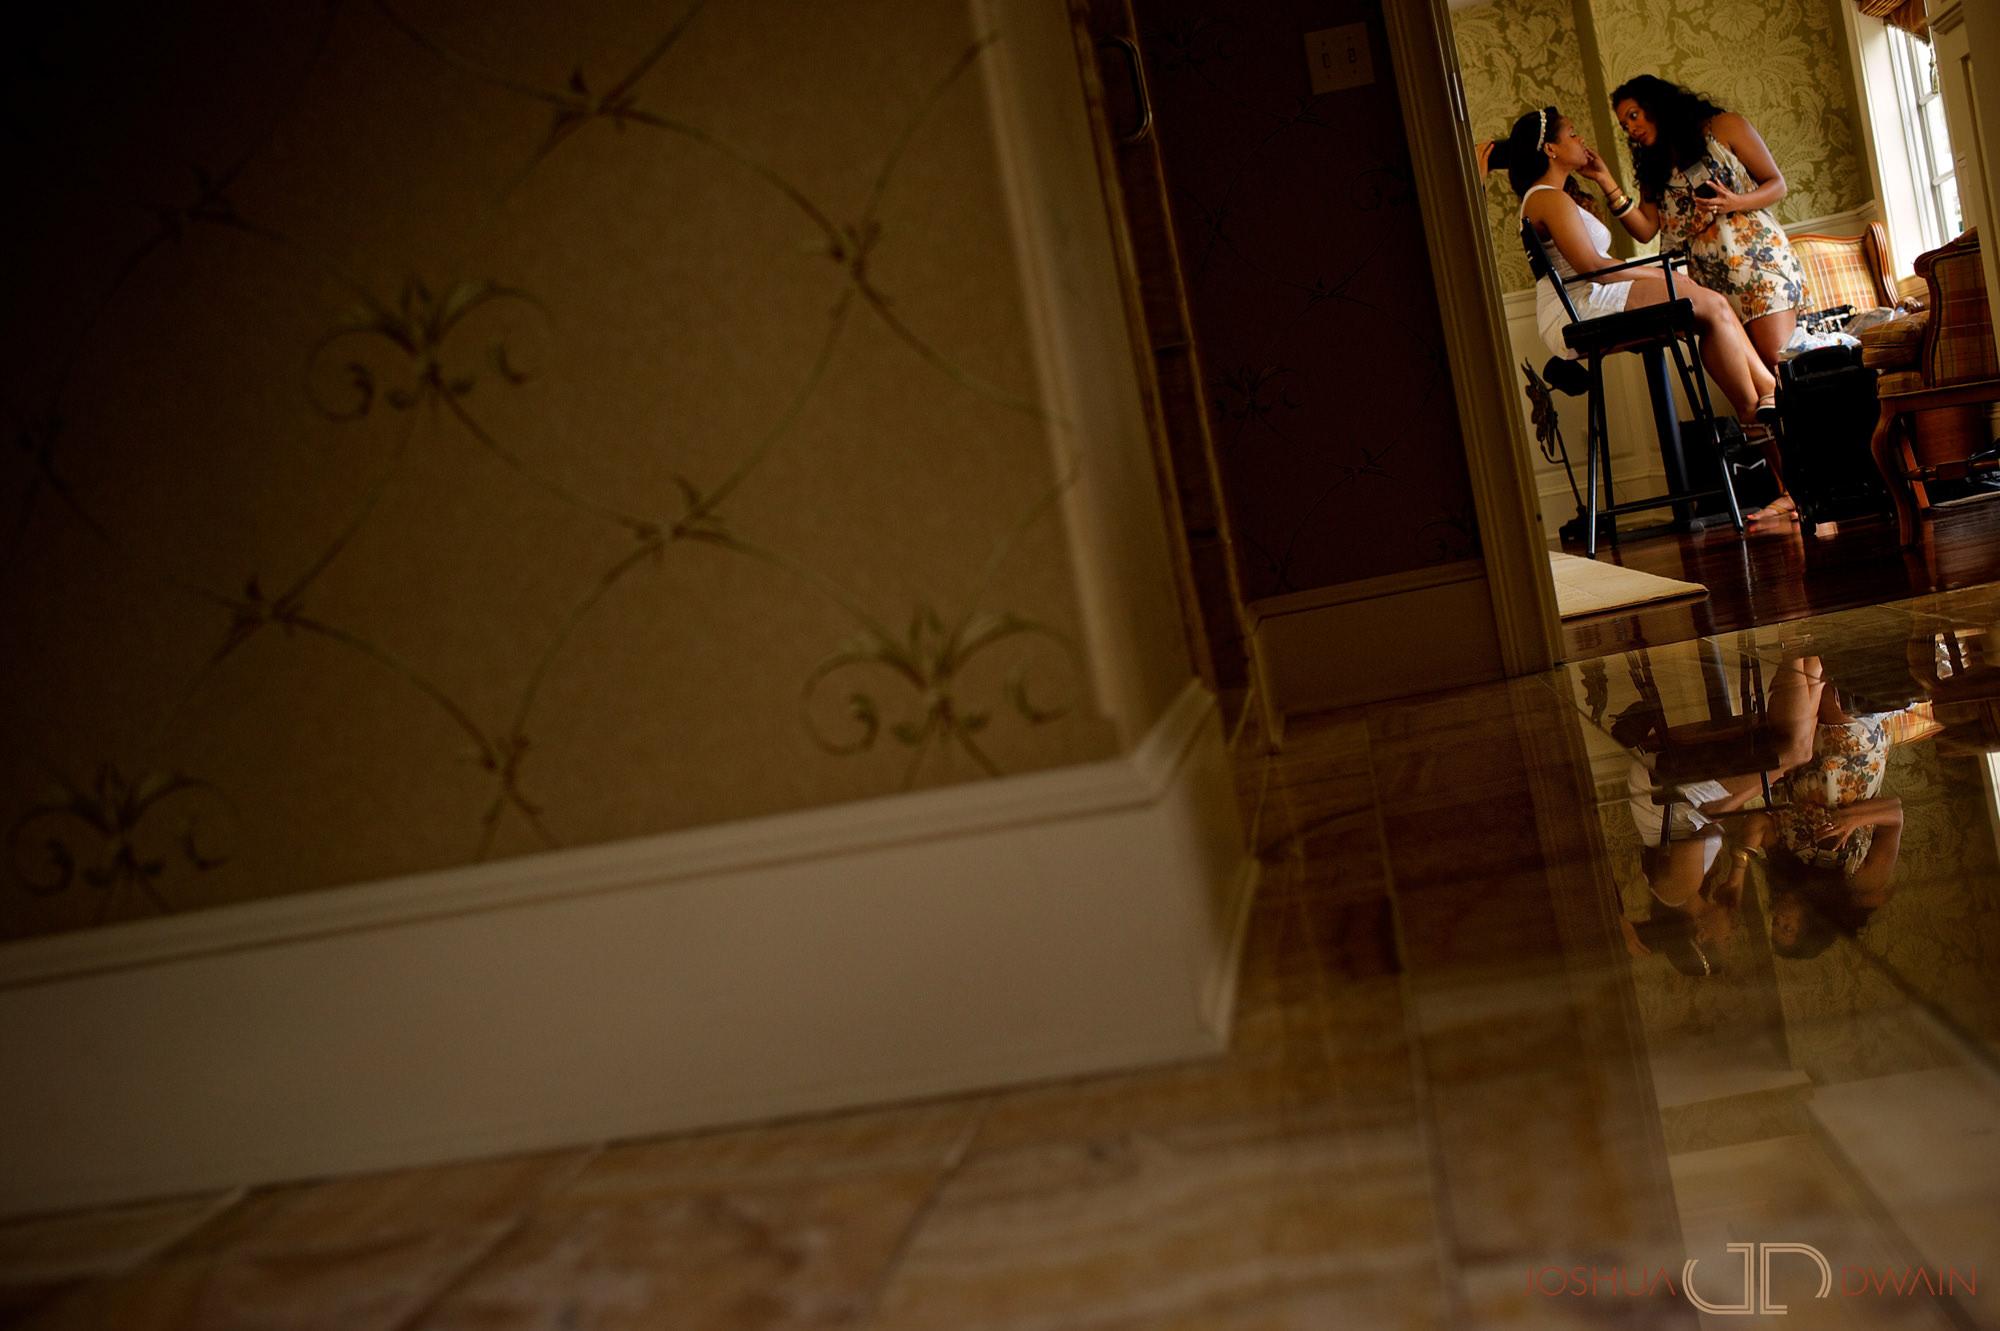 cadisha-antoine-005-ashford-estates-allentown-nj-wedding-photographer-joshua-dwain-photography-